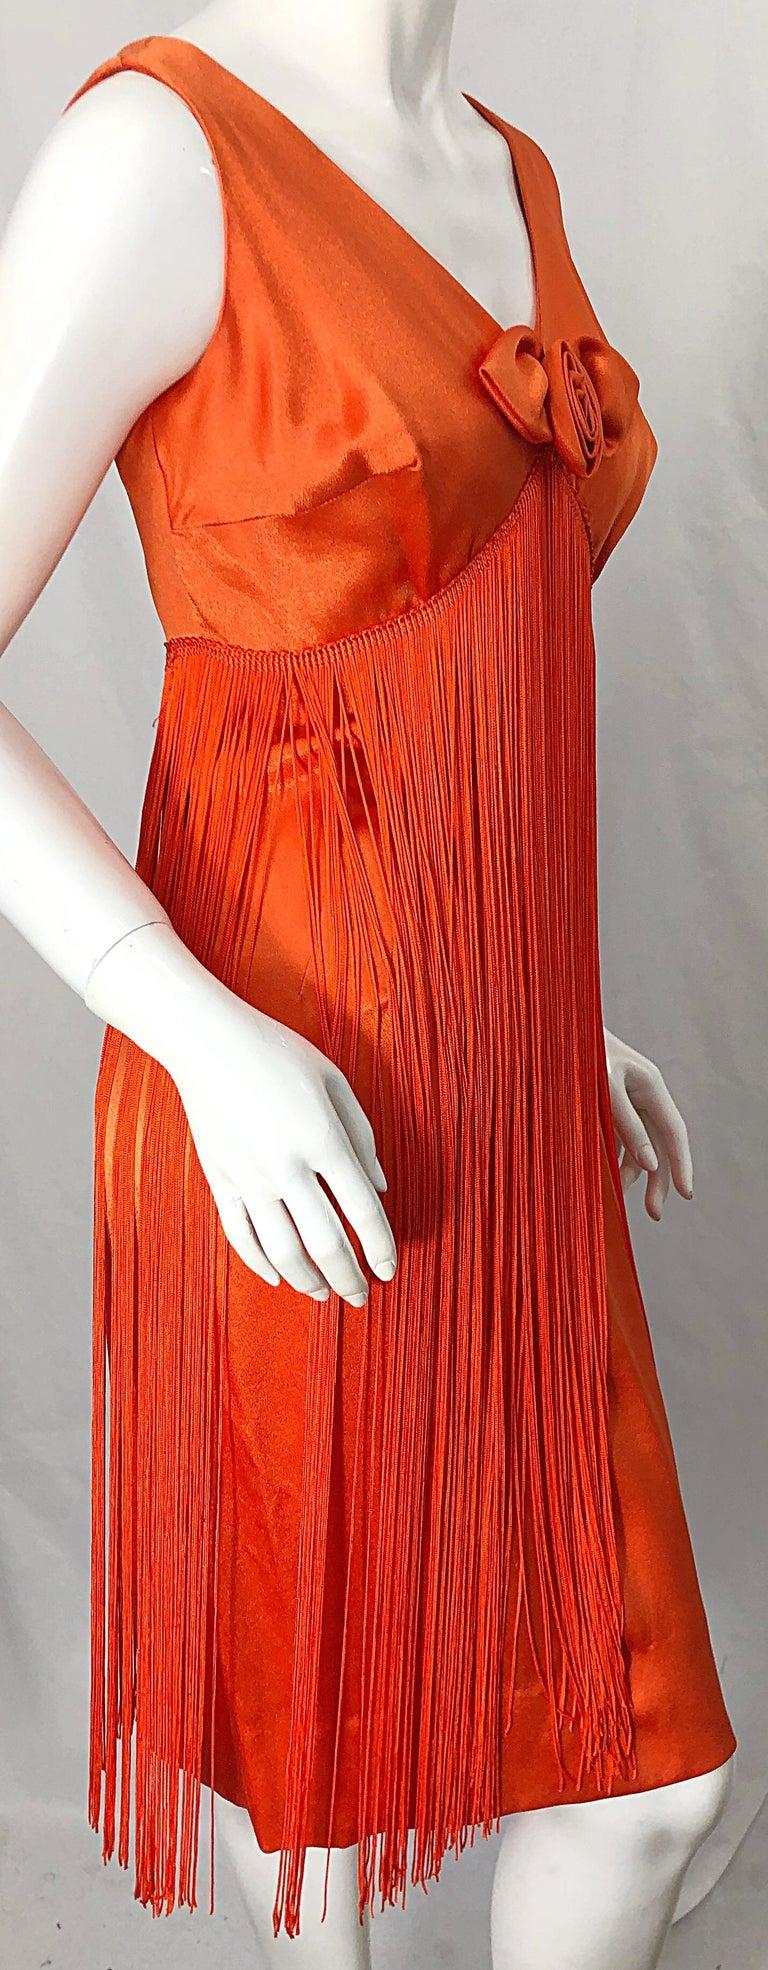 1960s Joseph Magnin Neon Orange Fully Fringed Vintage 60s Flapper Dress For Sale 6